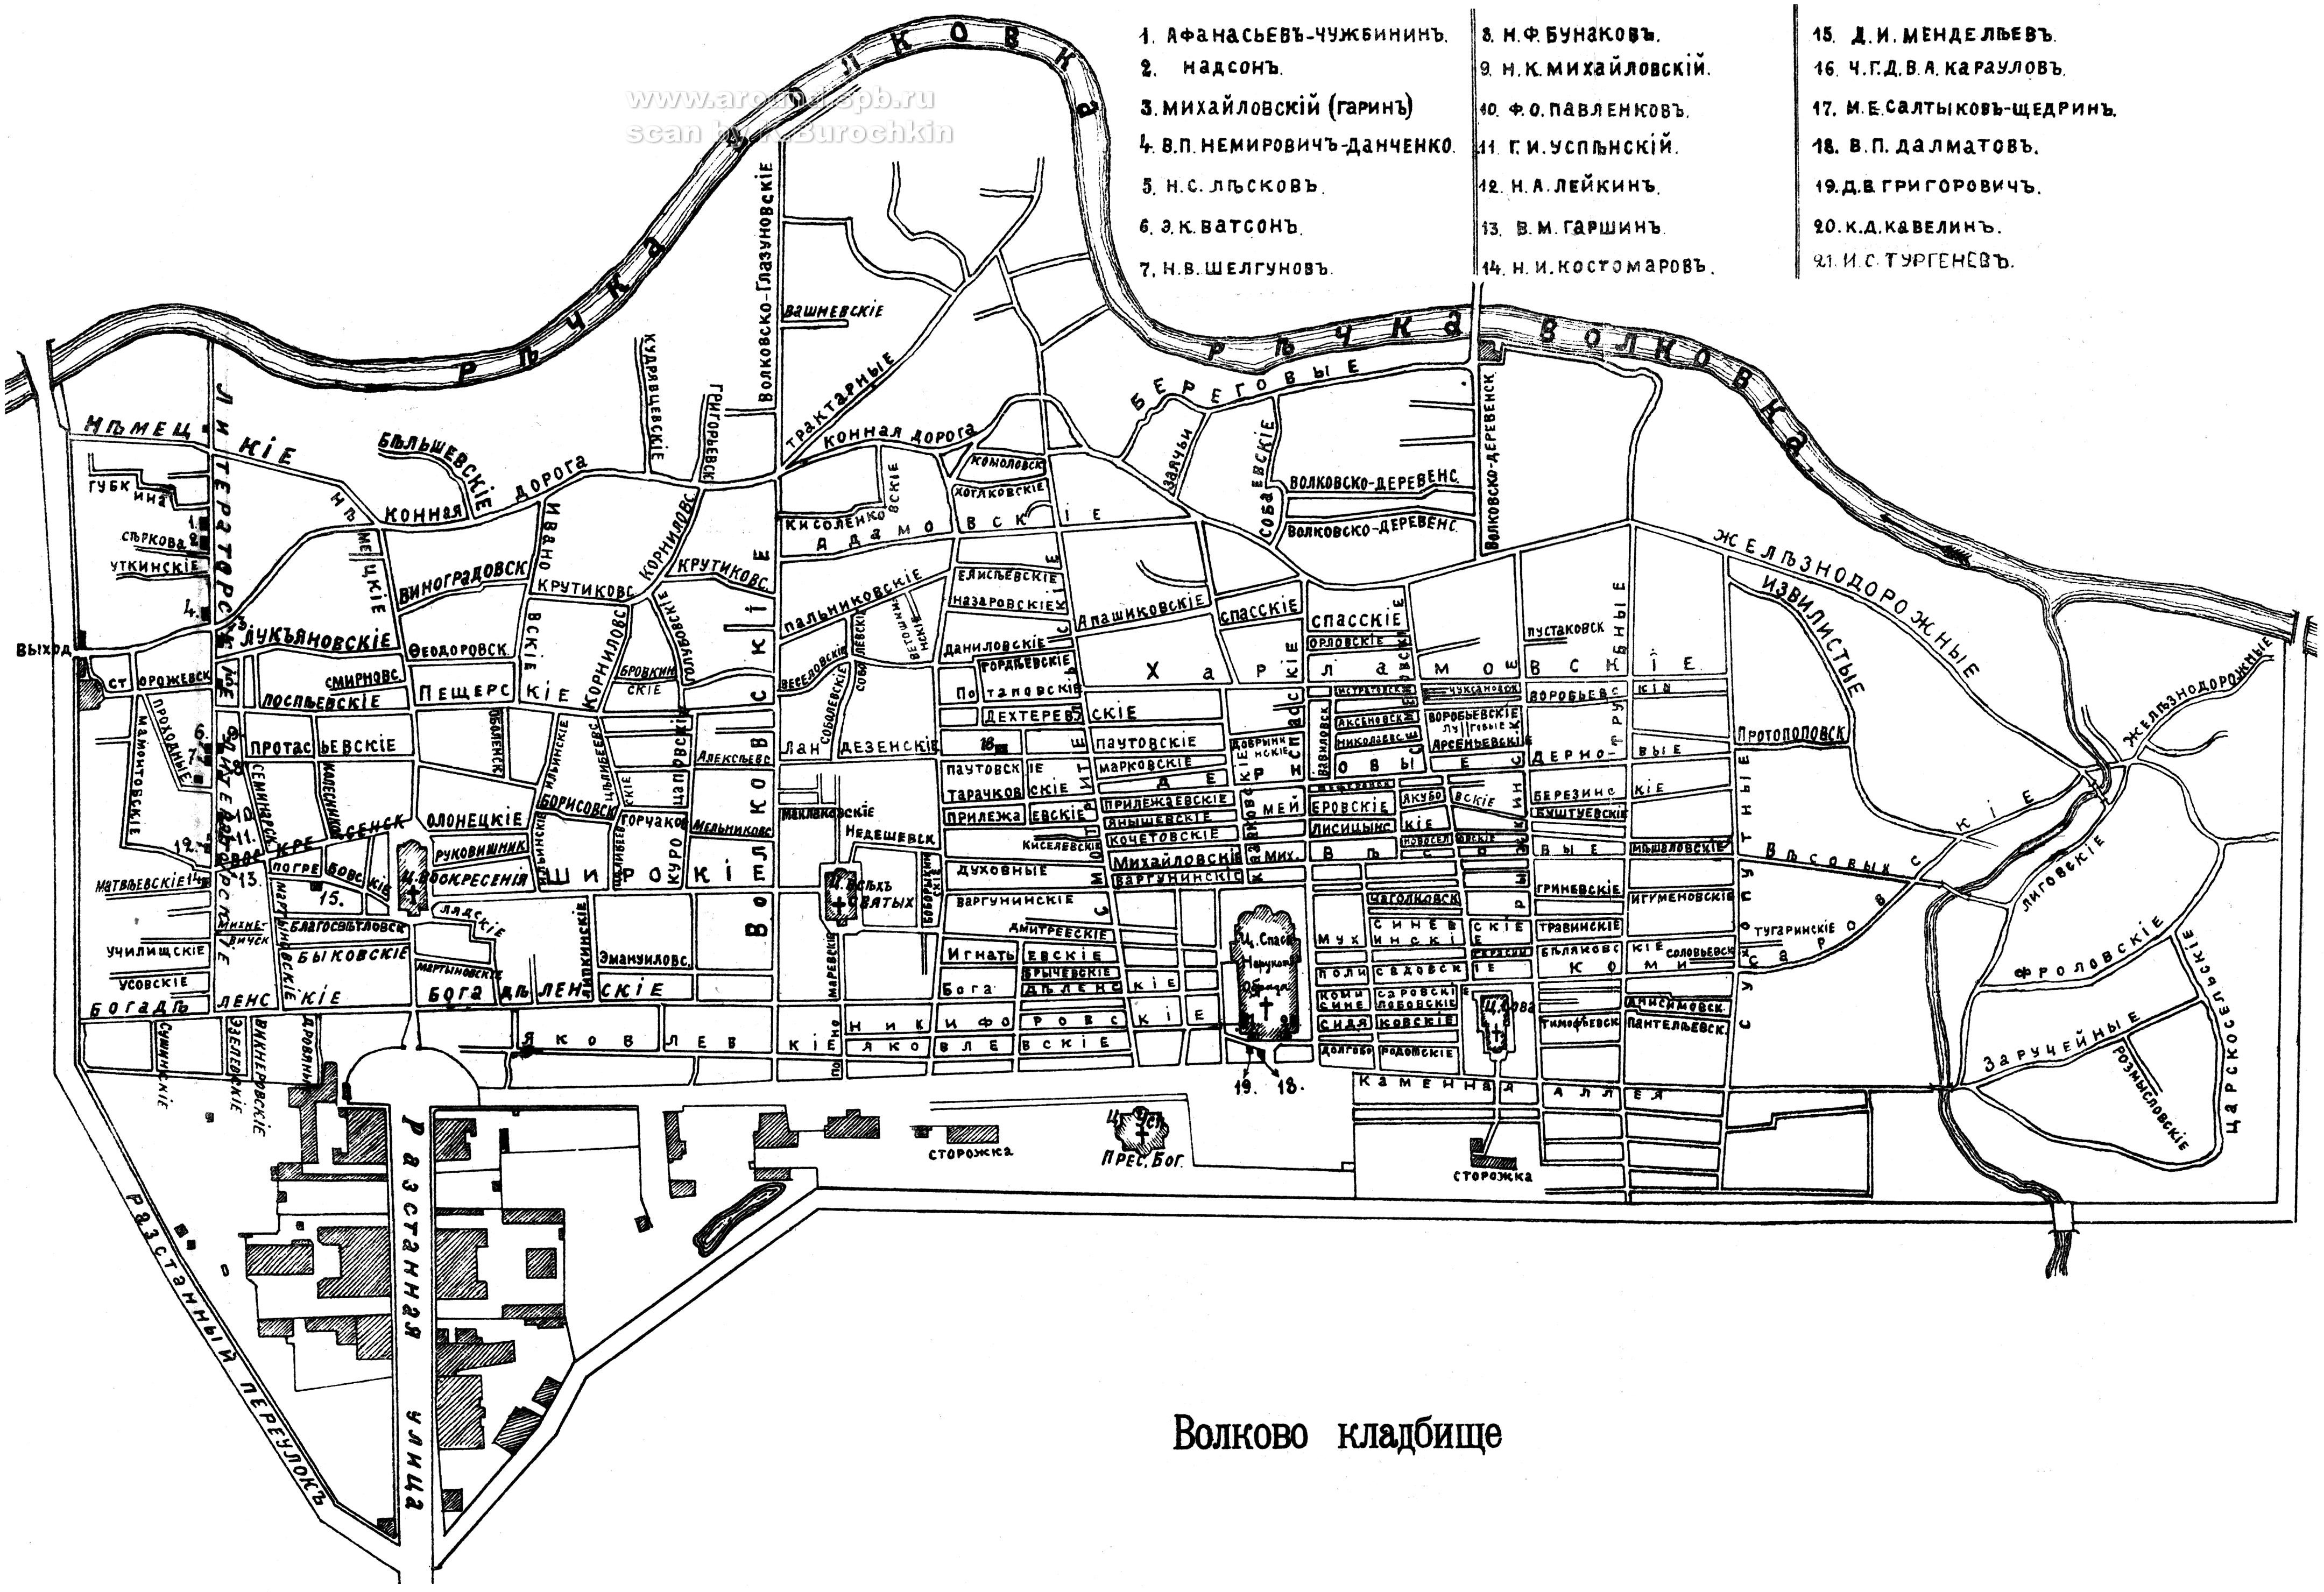 Богословское кладбище санкт-петербург схема